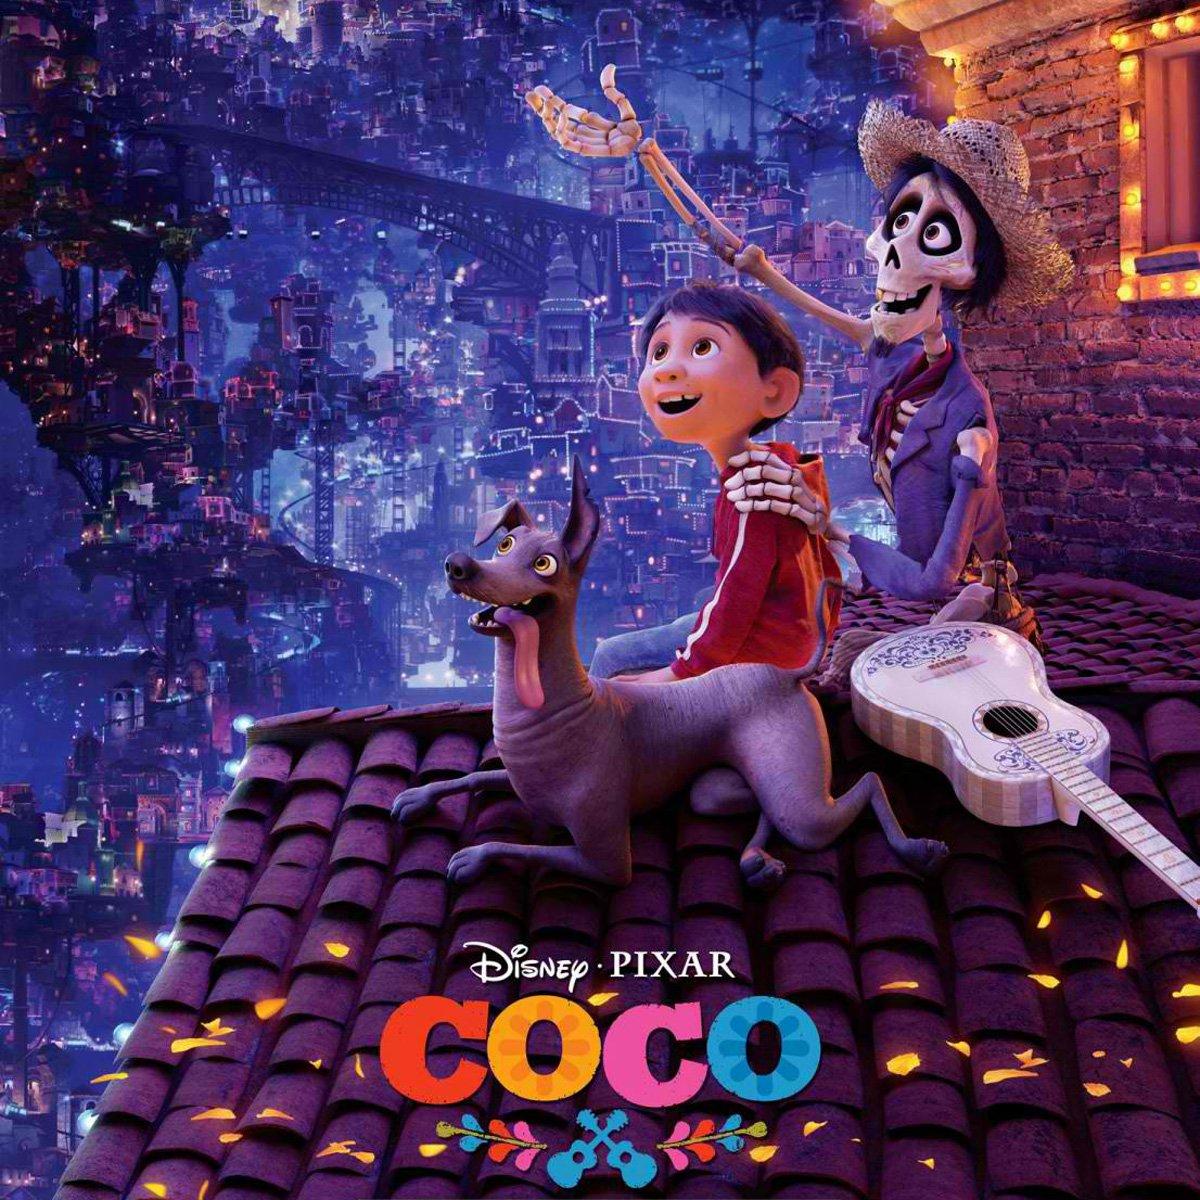 Coco movie poster.